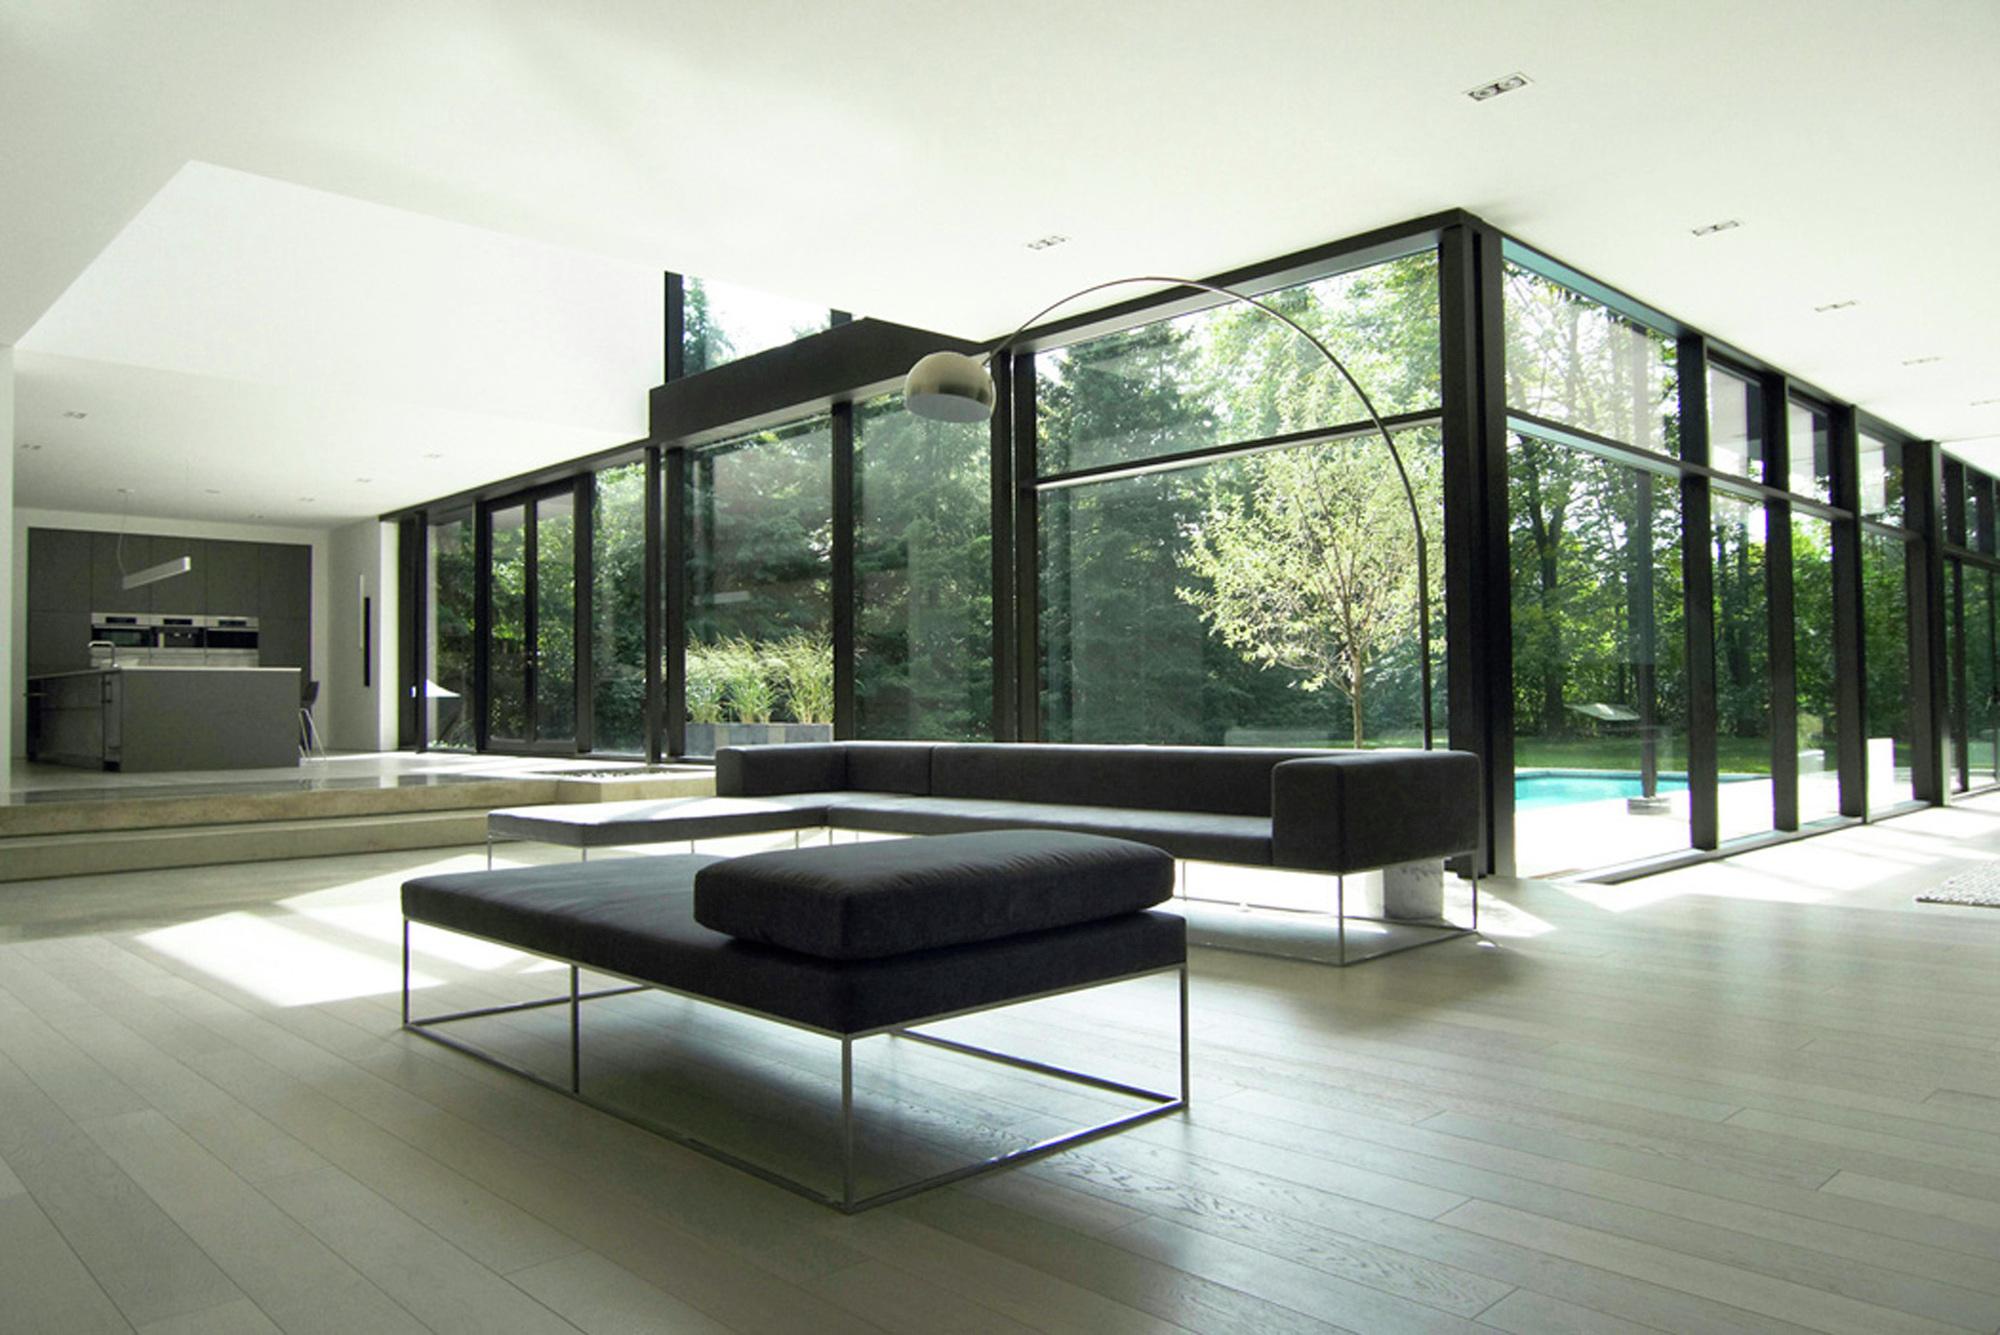 Gallery of oakville residence guido costantino 17 for Casa minimalista interior negro